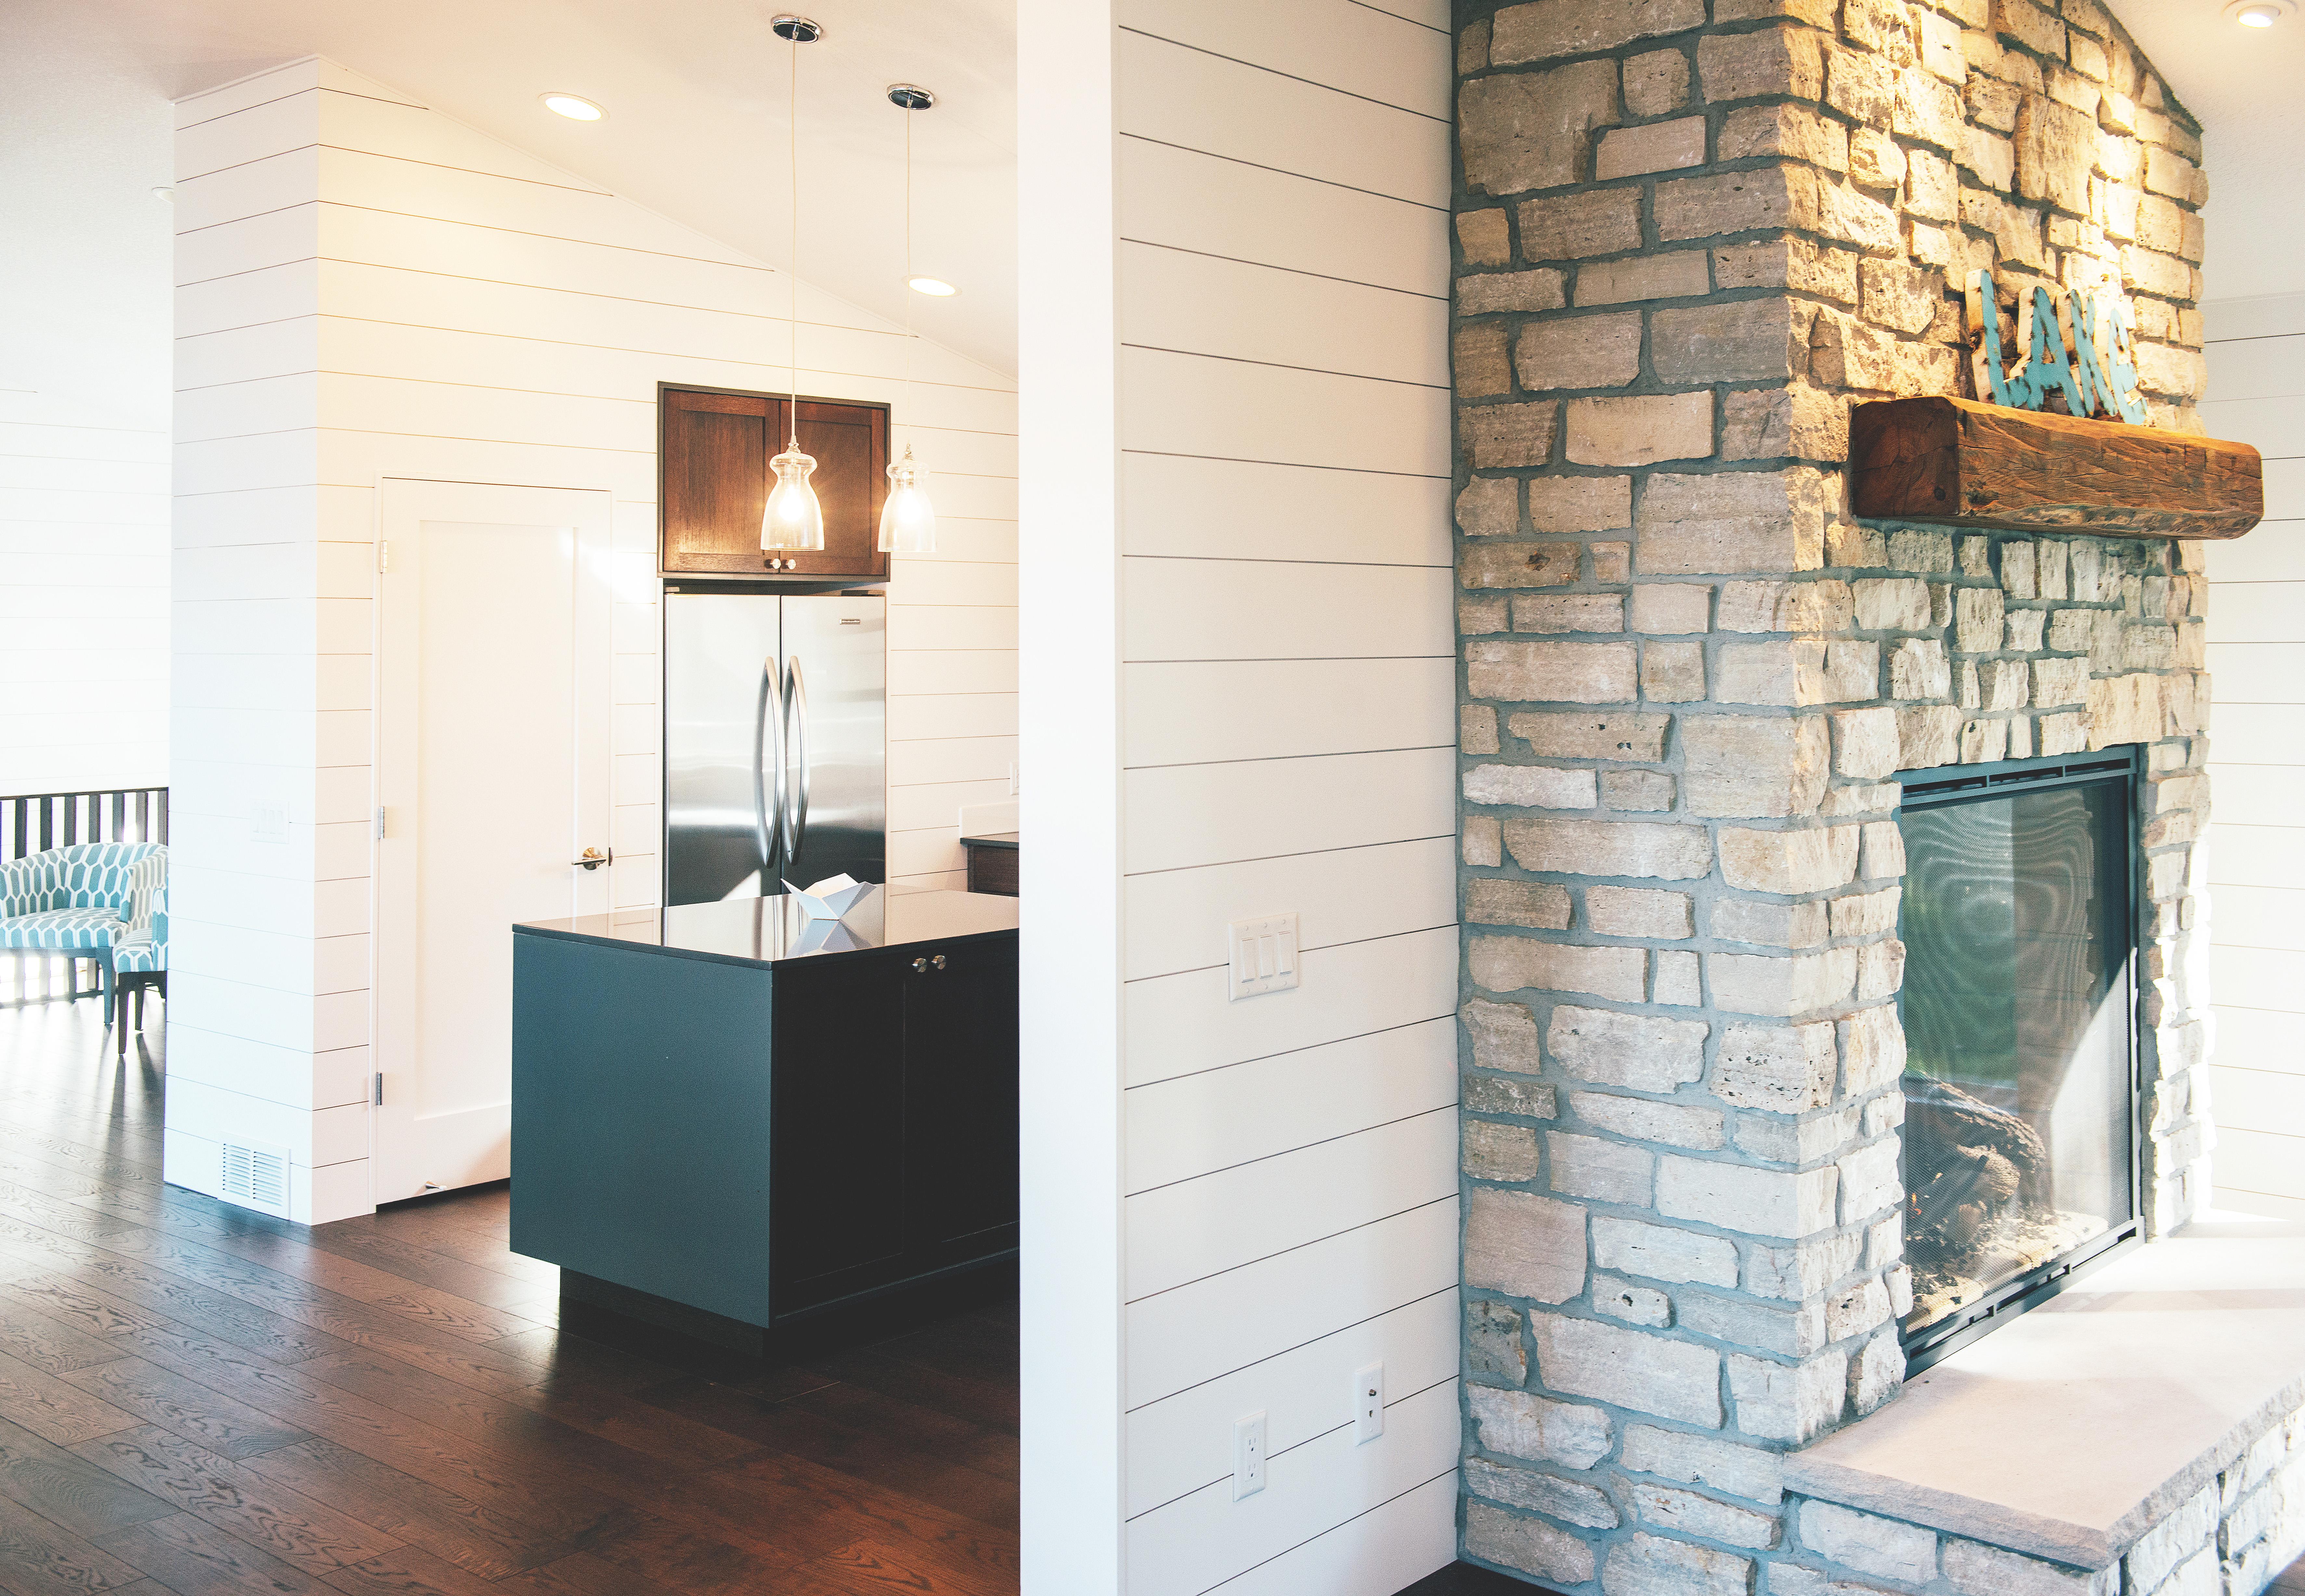 DSC_0693_fireplace and kitchen_rev